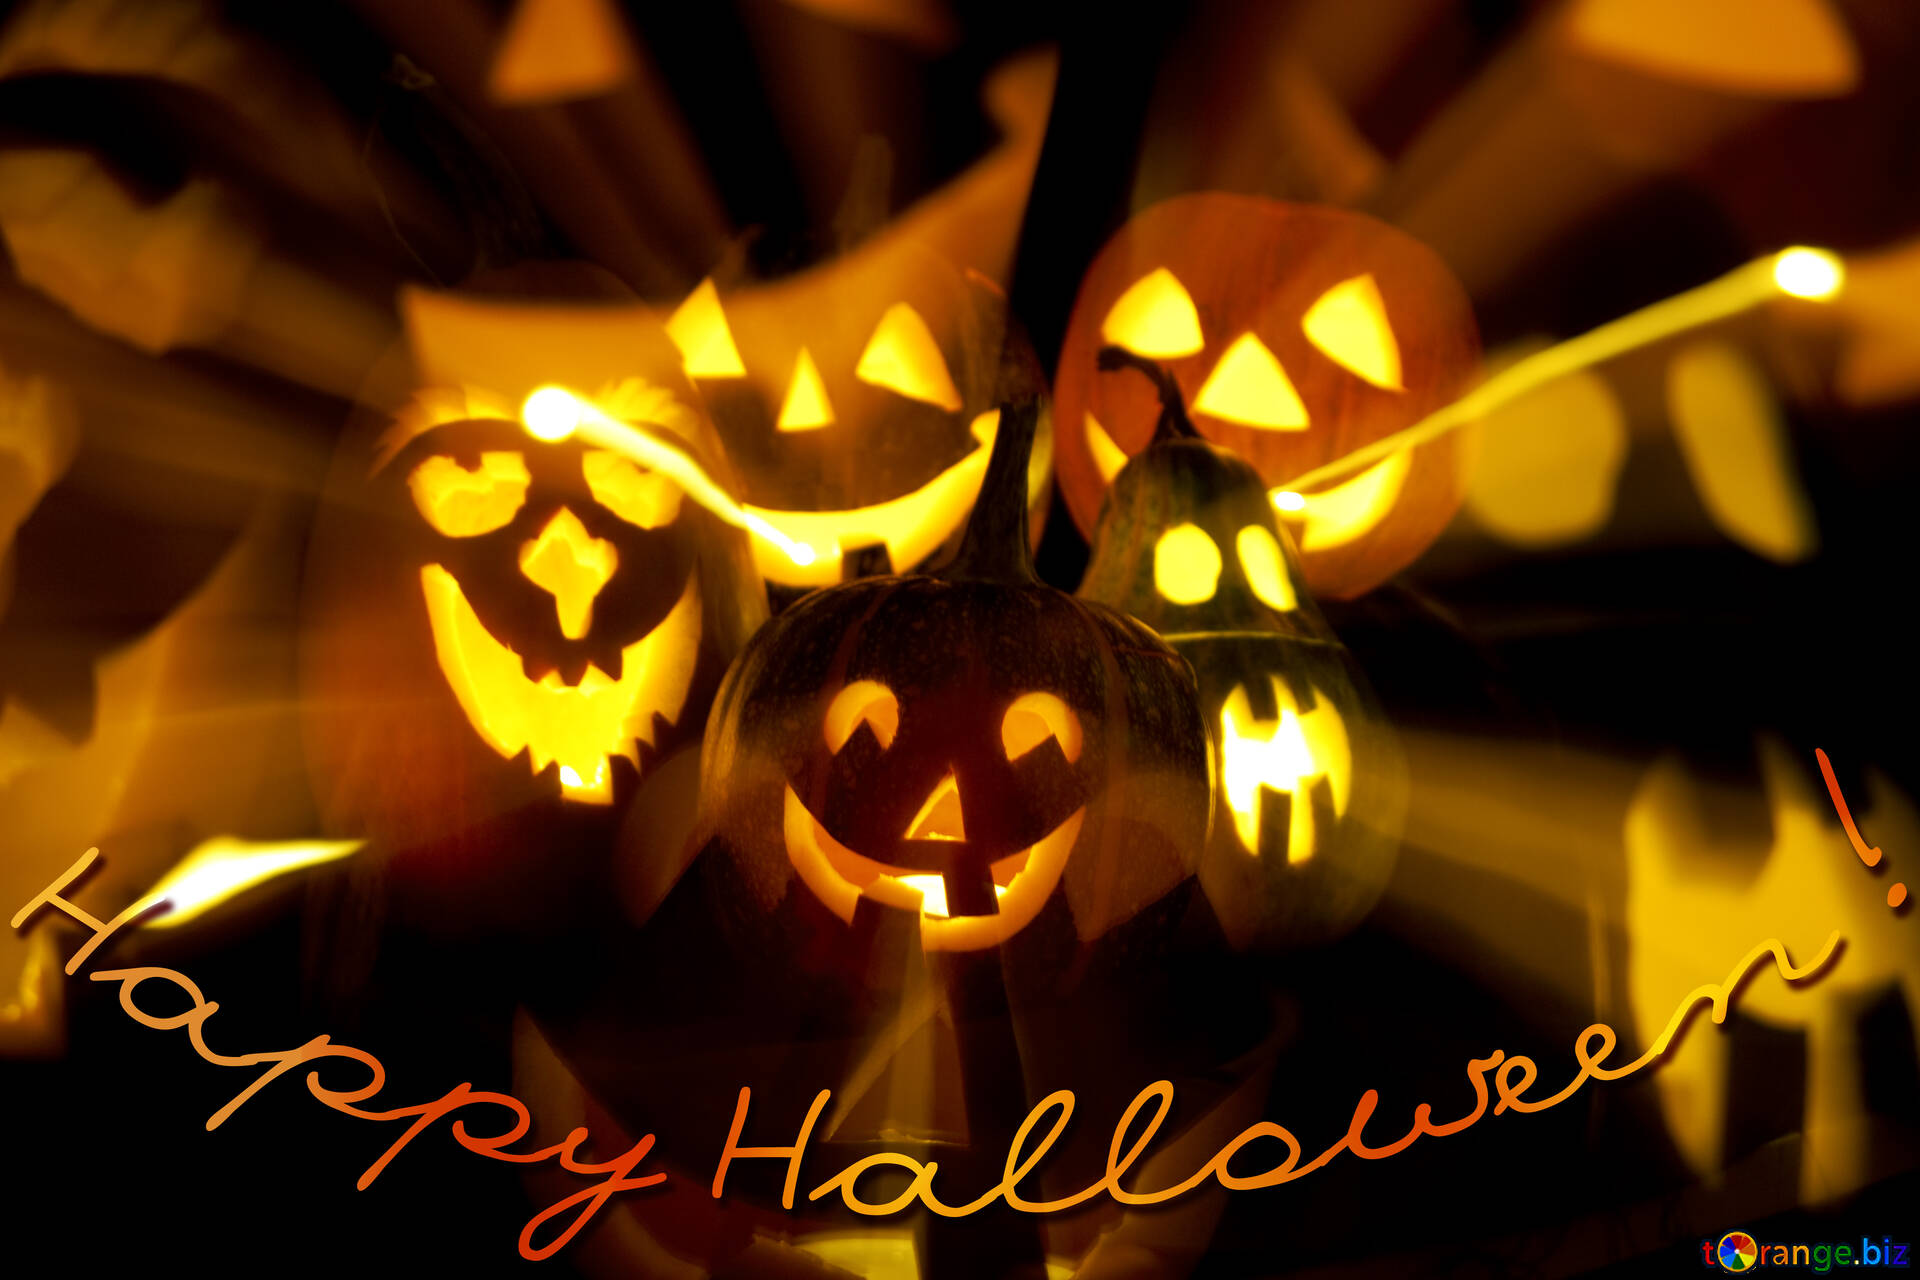 Дня прикол, хэллоуин открытки картинки